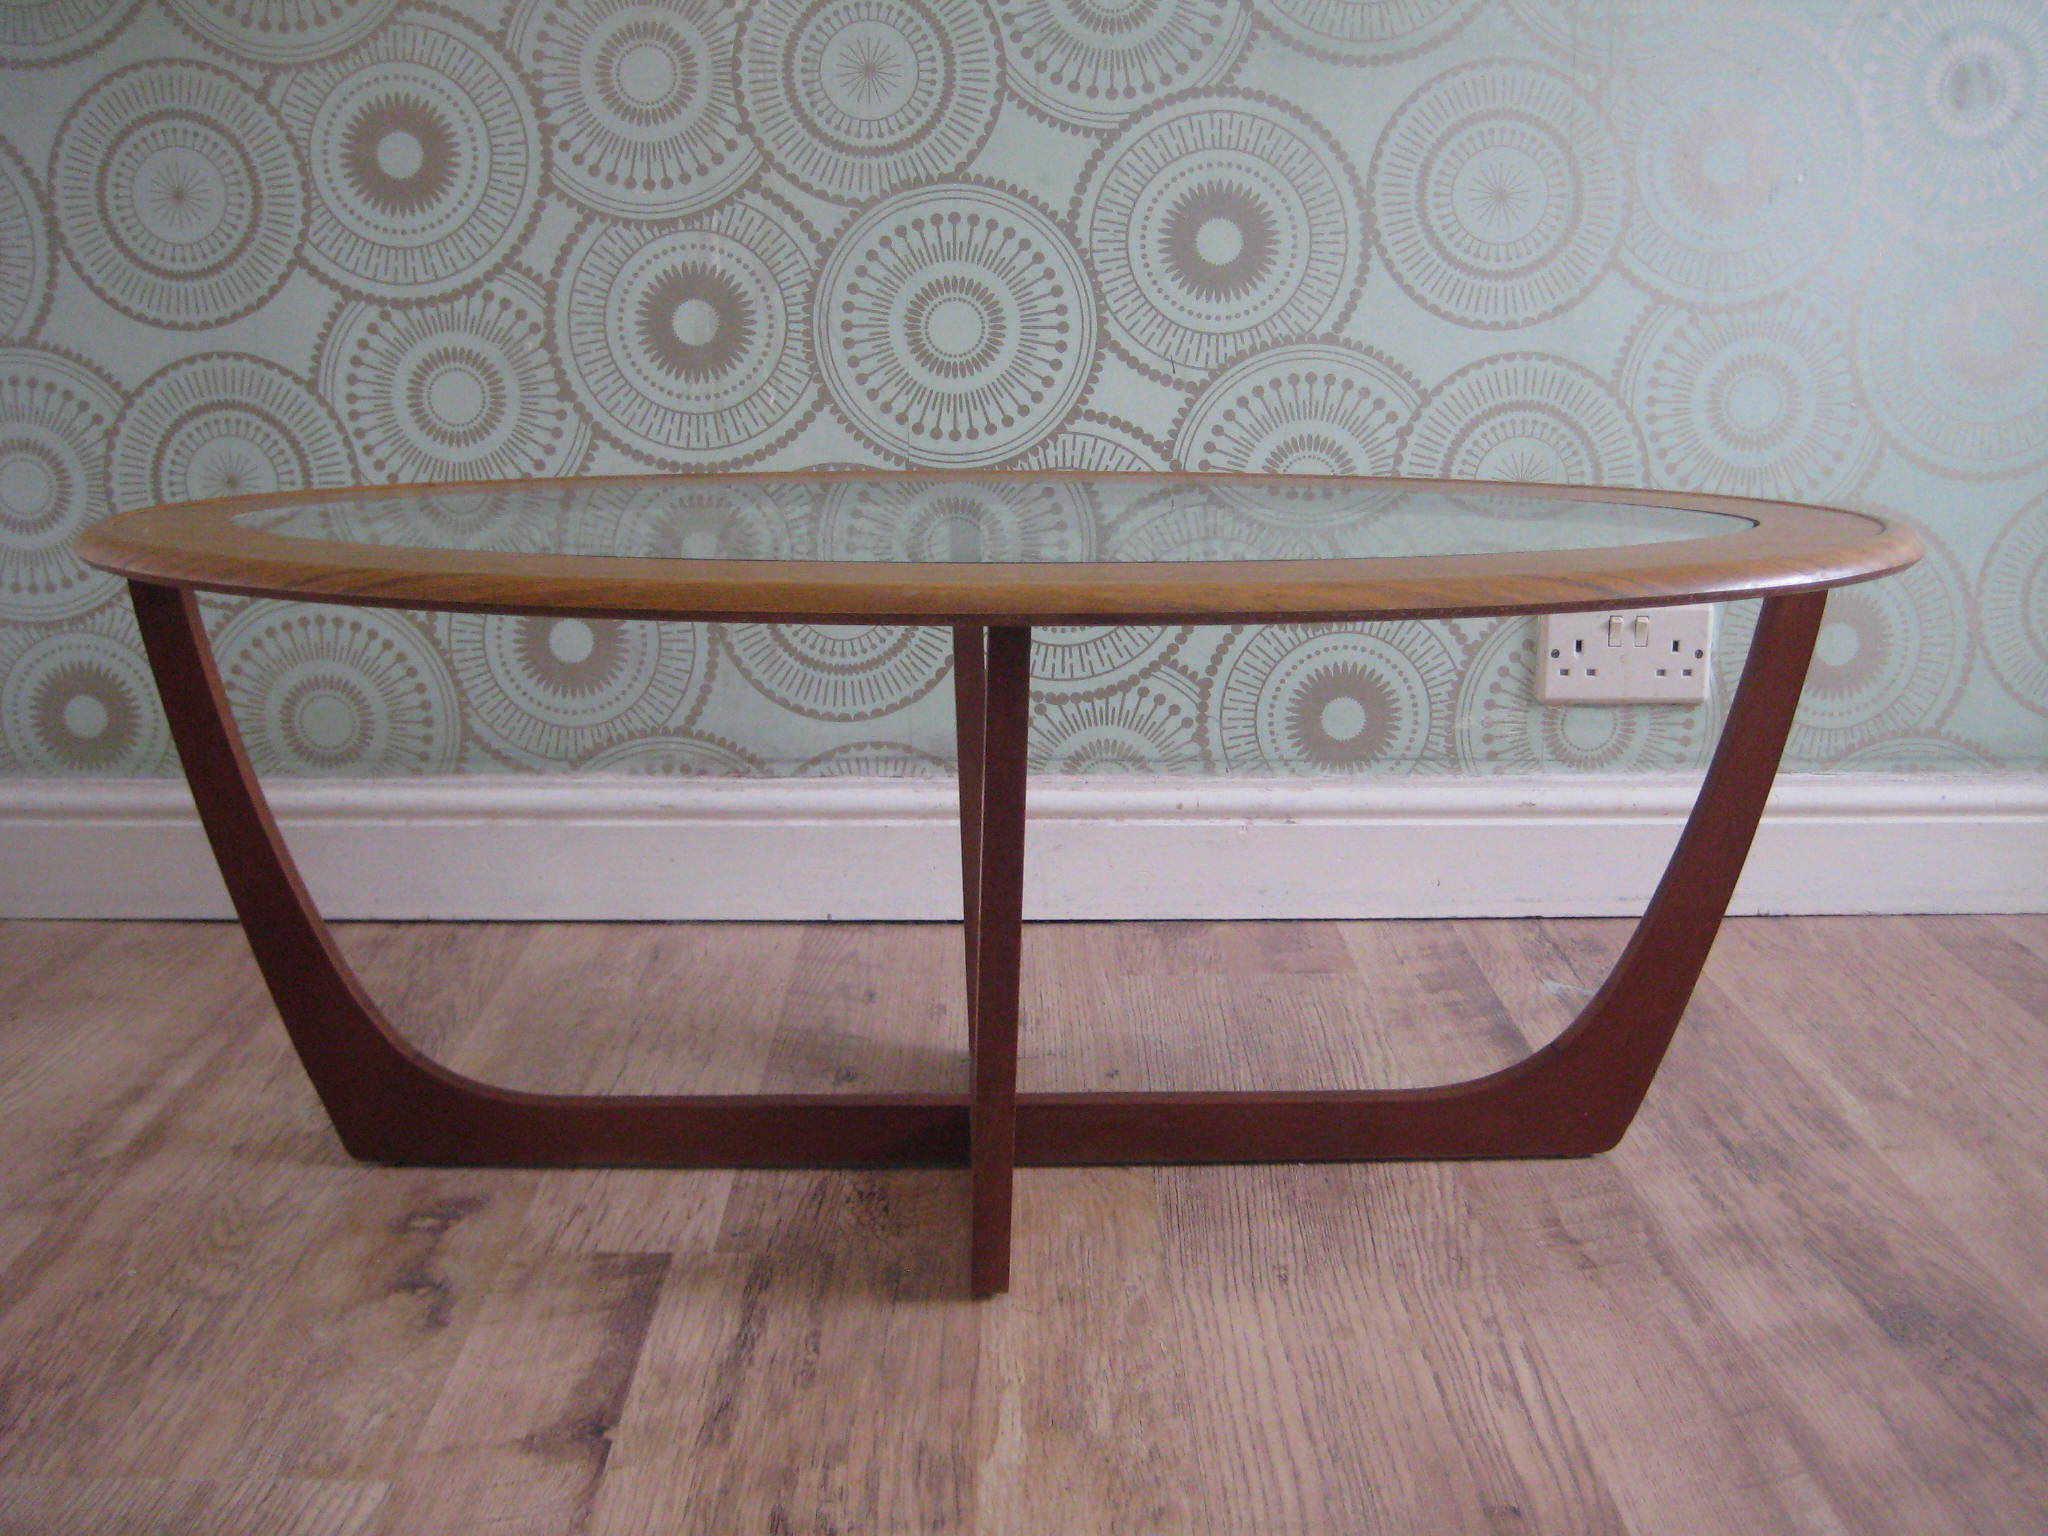 Delightful 1970s Mid Century Oval Glass Top Teak Coffee ...